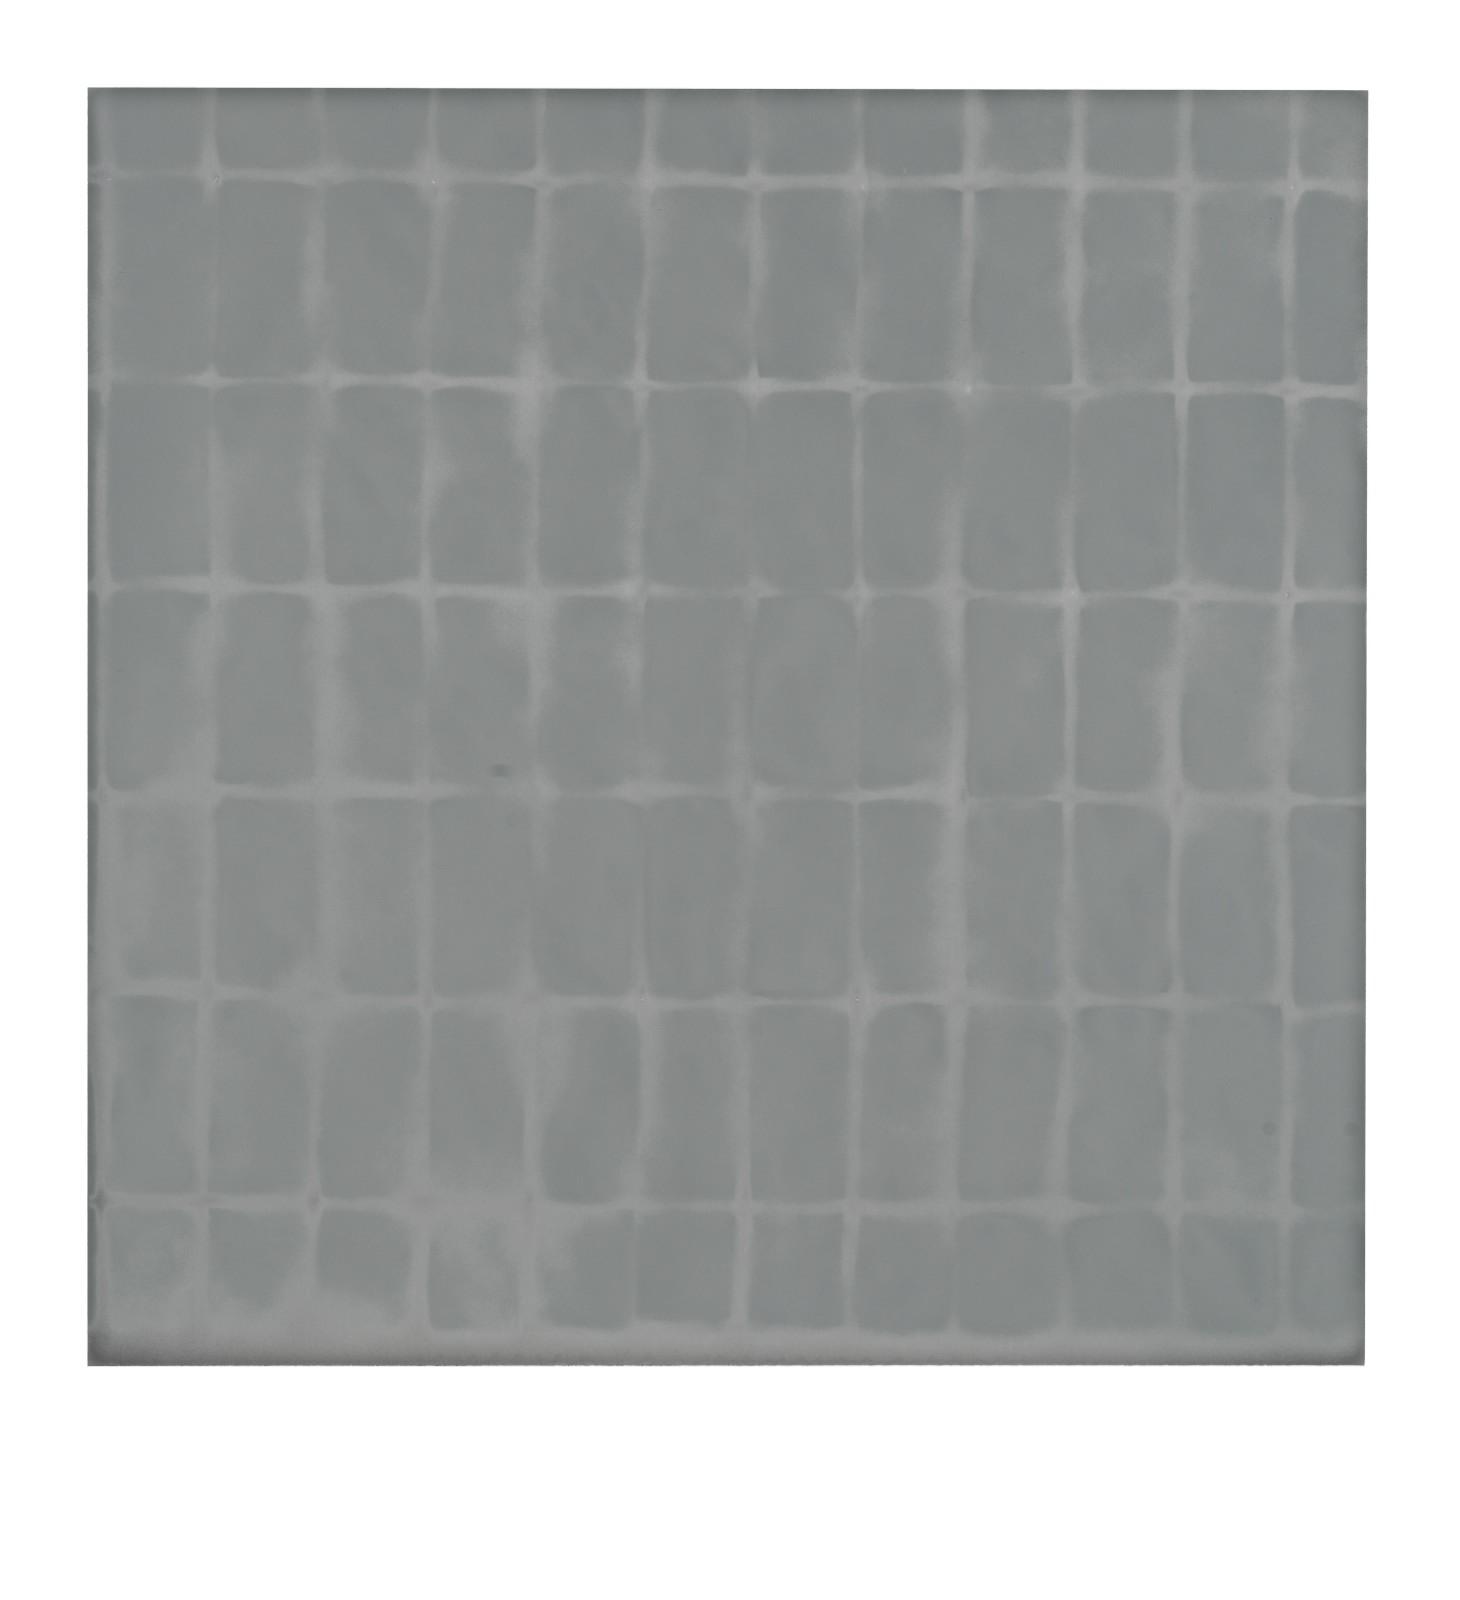 "STAIN : 55°36'24.8""N 13°00'19.1""E, 2016, spraypaint on aluminium, 81,3 x 81,3 cm"